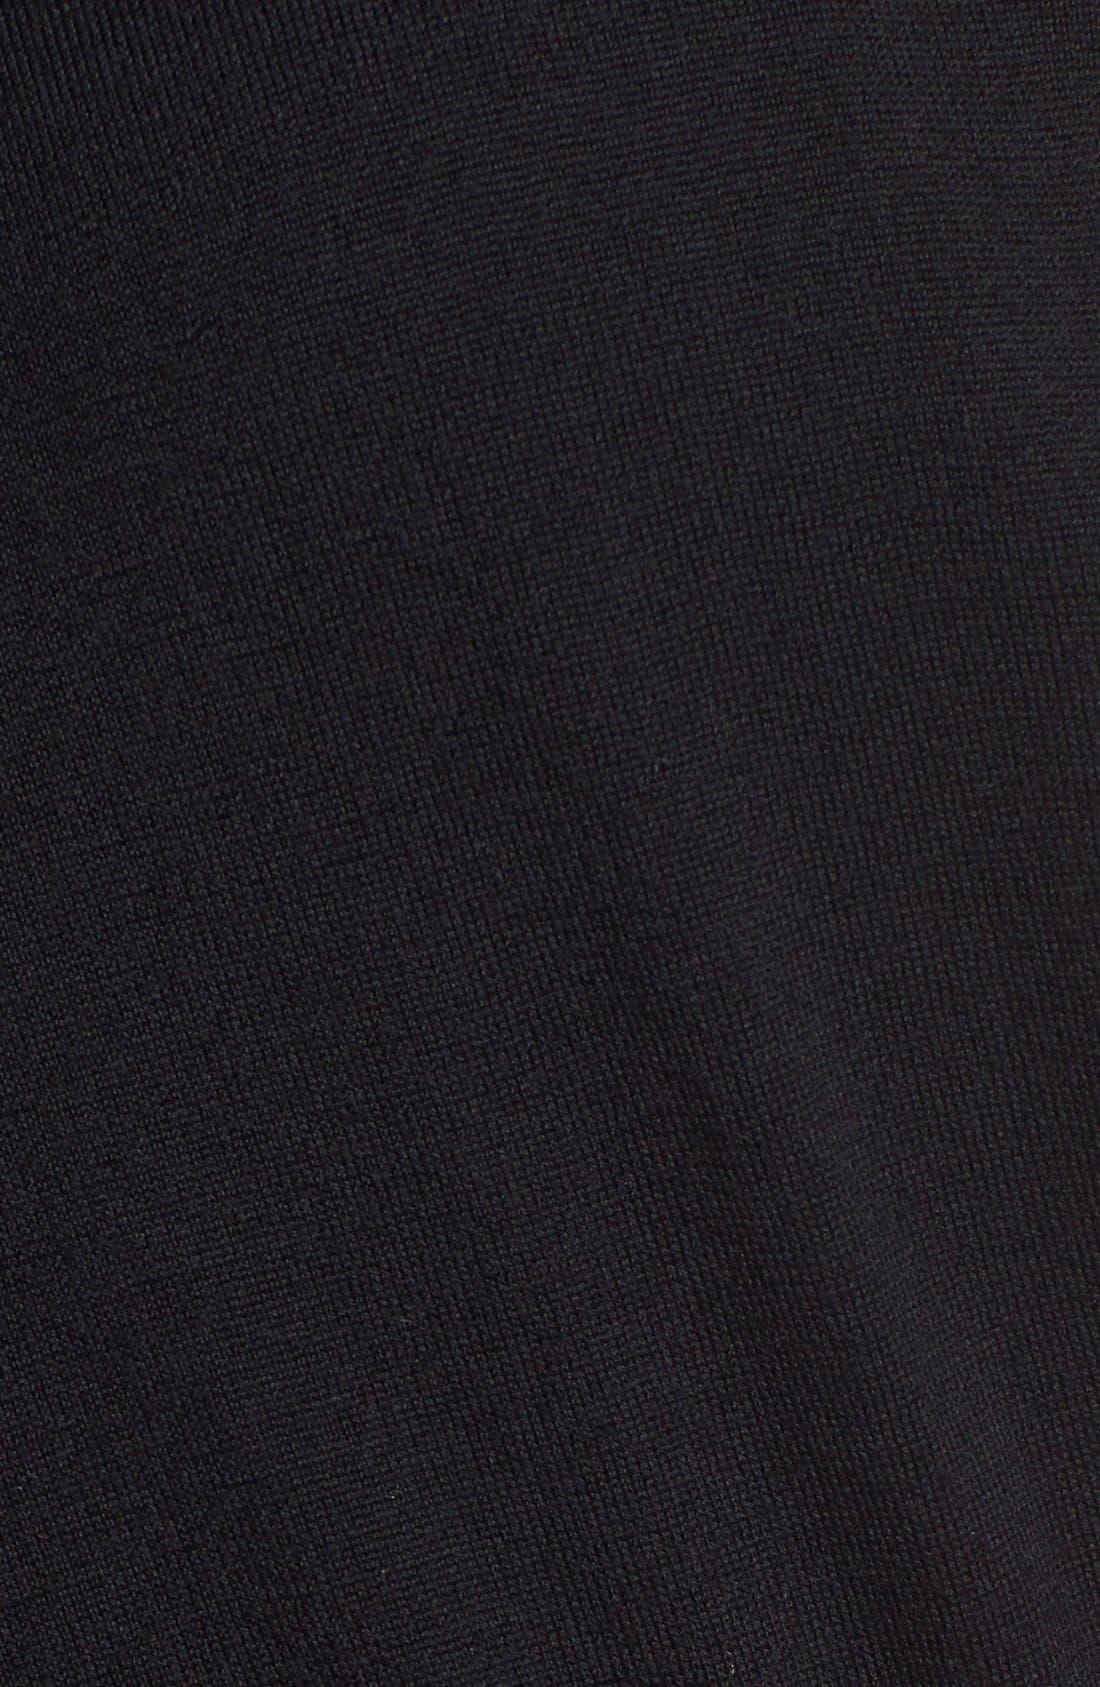 Regular Fit Crewneck Sweater,                             Alternate thumbnail 4, color,                             001